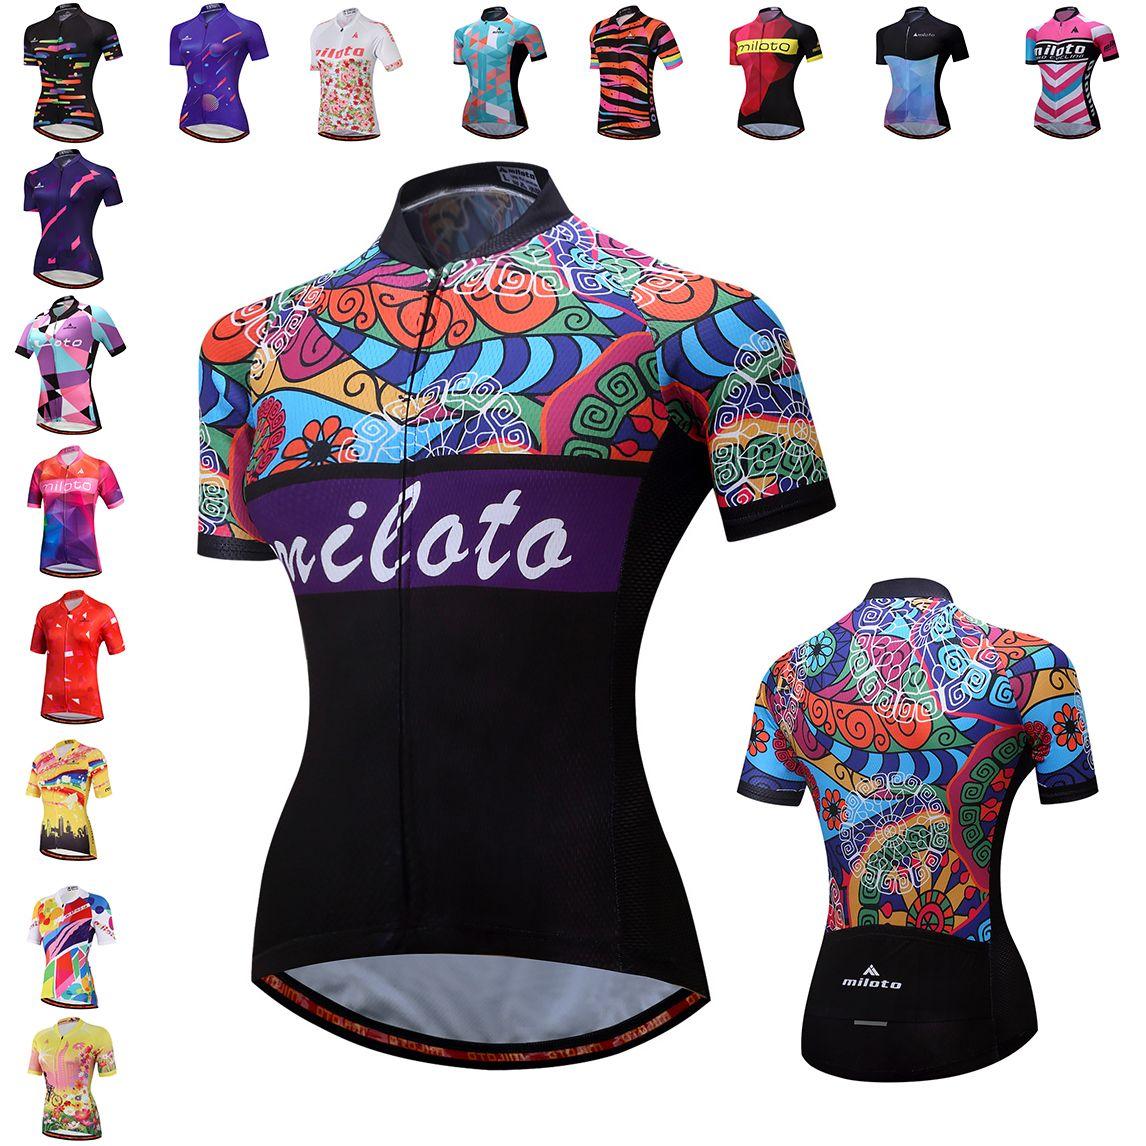 b037c5718 New Hot Sale Women Cycling Jersey Bike Top Shirt Summer Short Sleeve MTB  Cycling Clothing Ropa Maillot Ciclismo Racing Bicycle Clothes V Neck T  Shirts Long ...